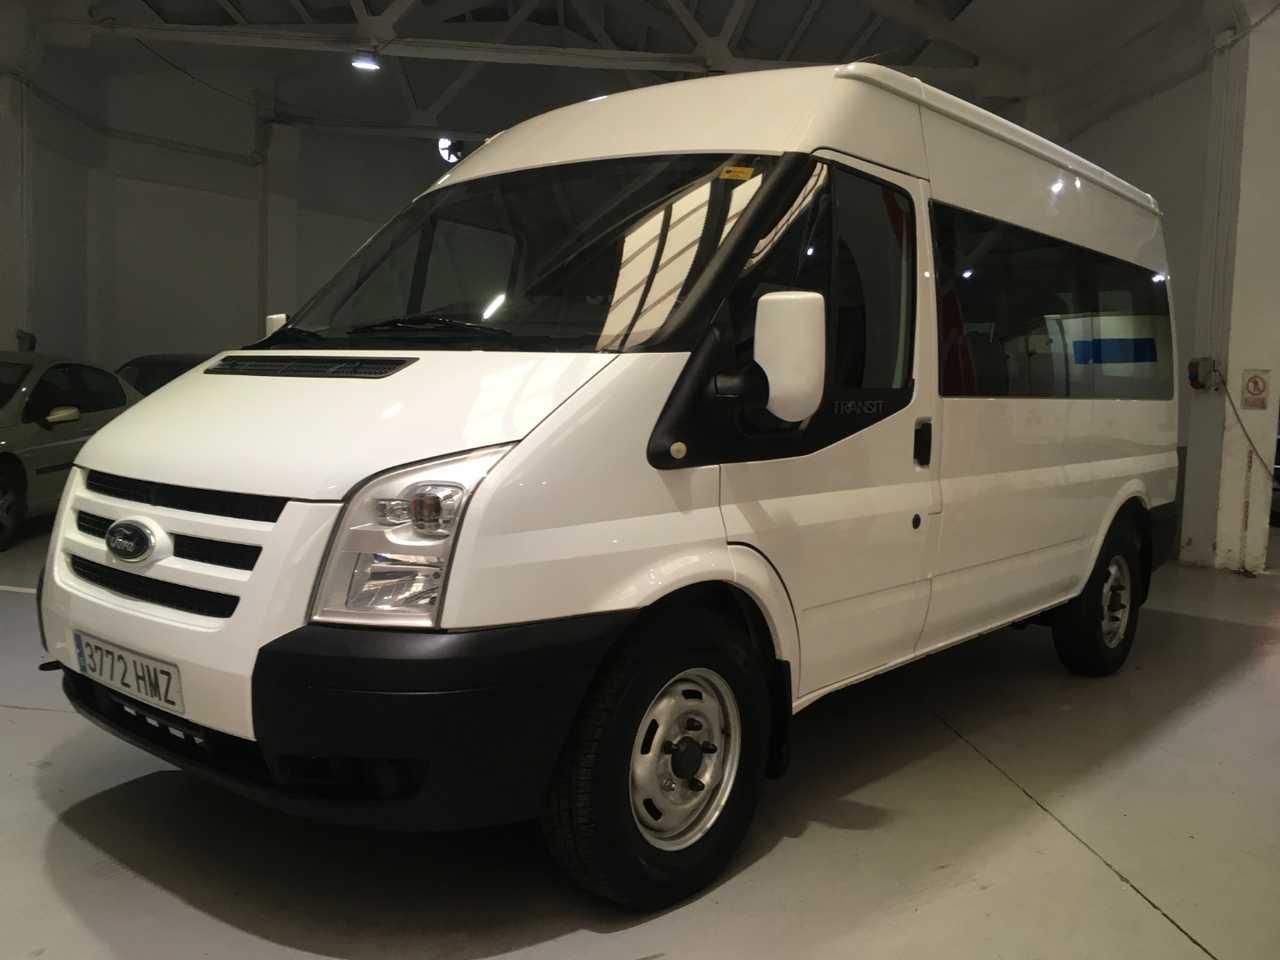 Ford Transit  Minibus y Kombi 330M 2.2 TDCI 125cv L2H2 9 Plazas kombi   - Foto 1